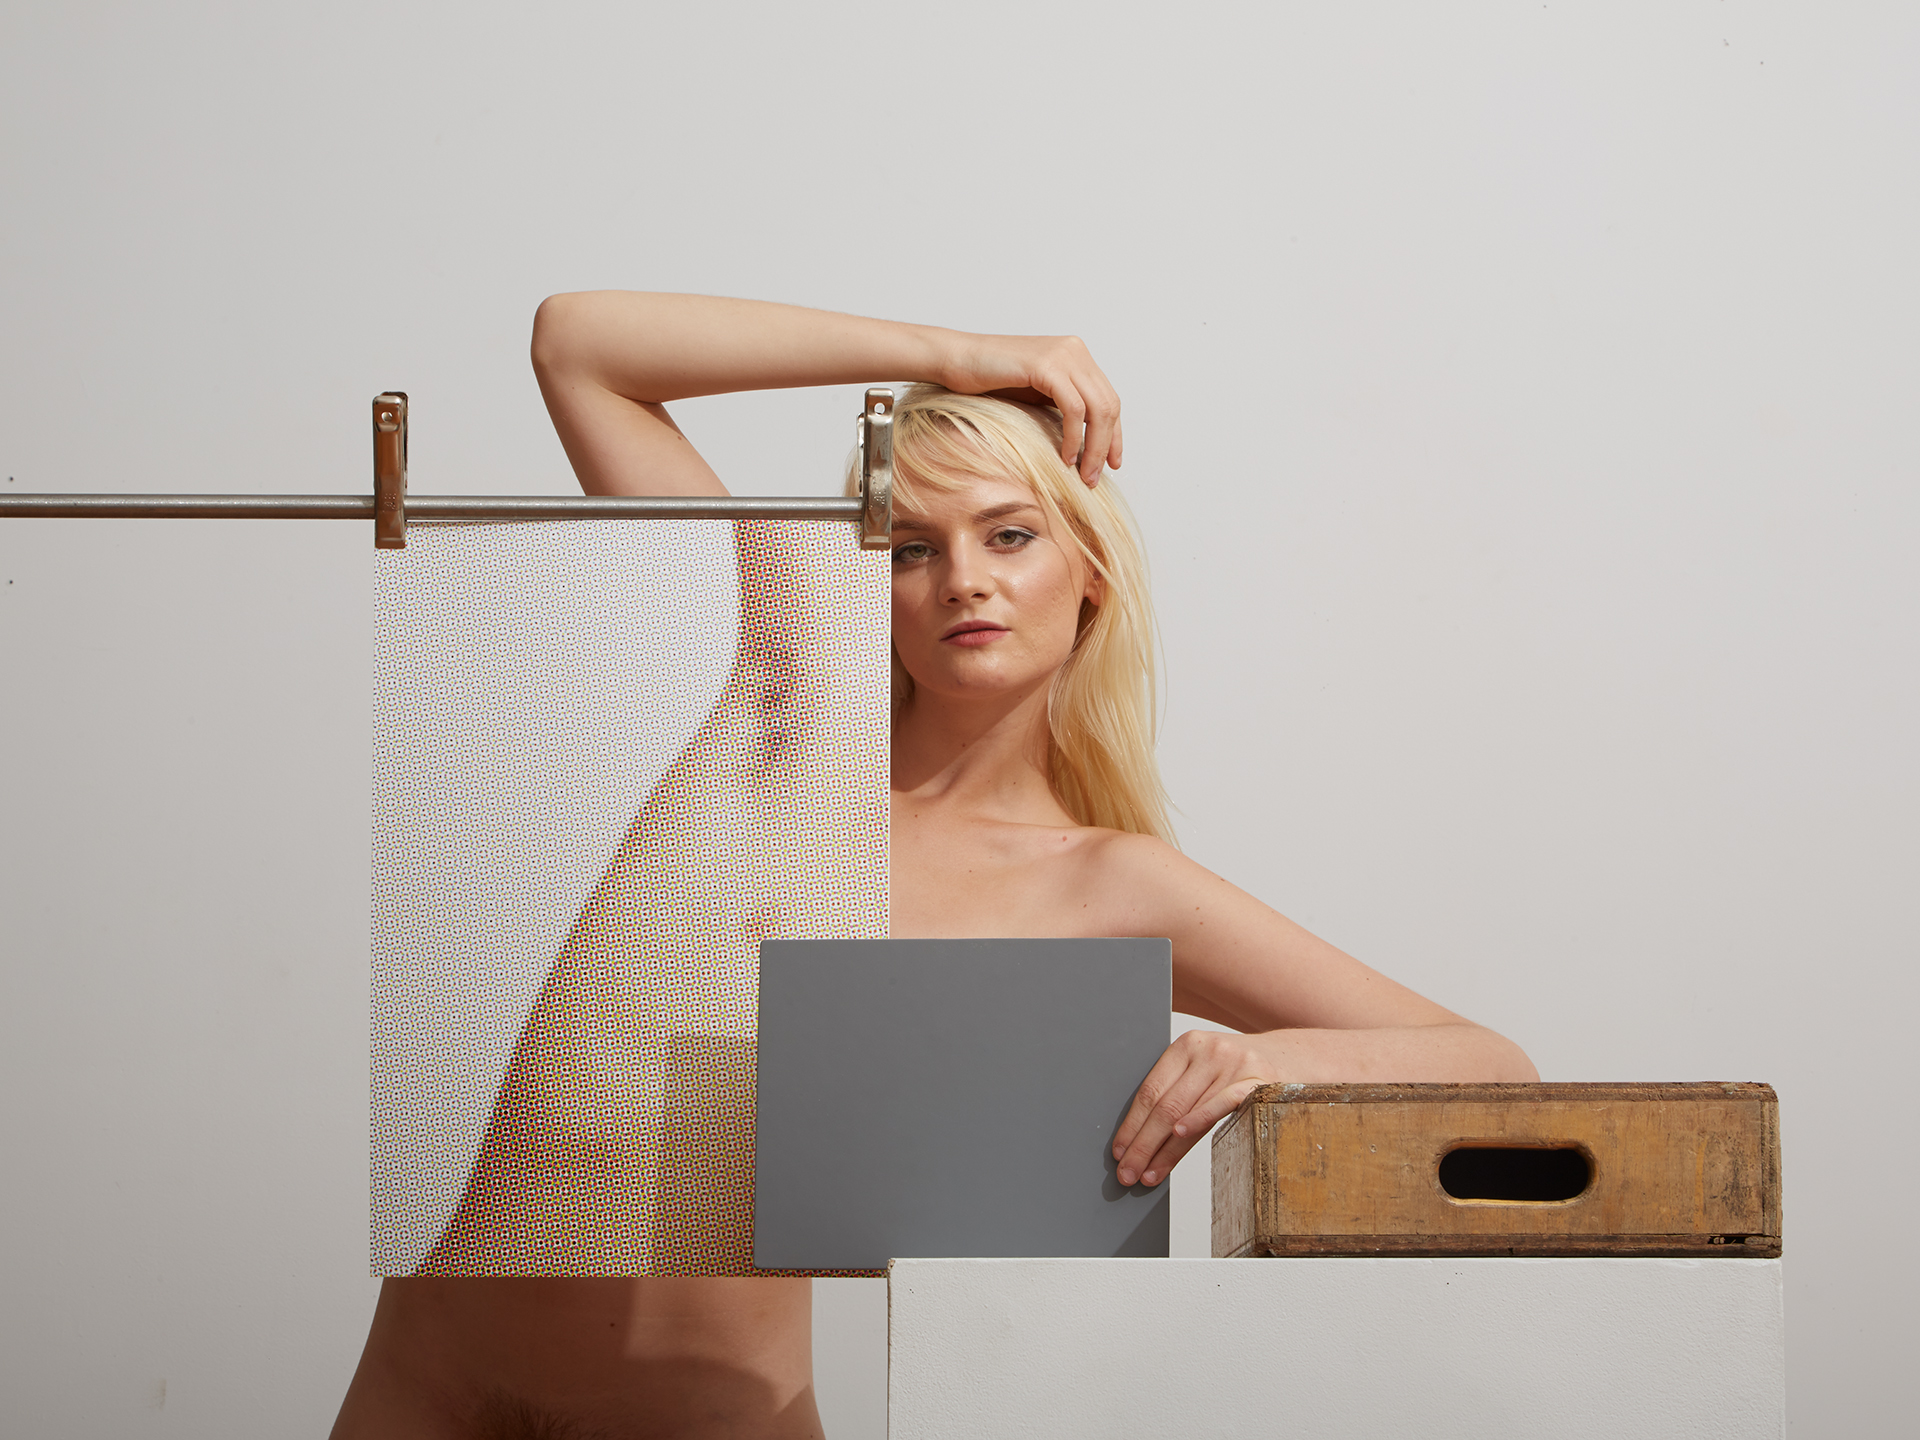 Erin with Halftone Self Portrait and Half Apple Box  2015